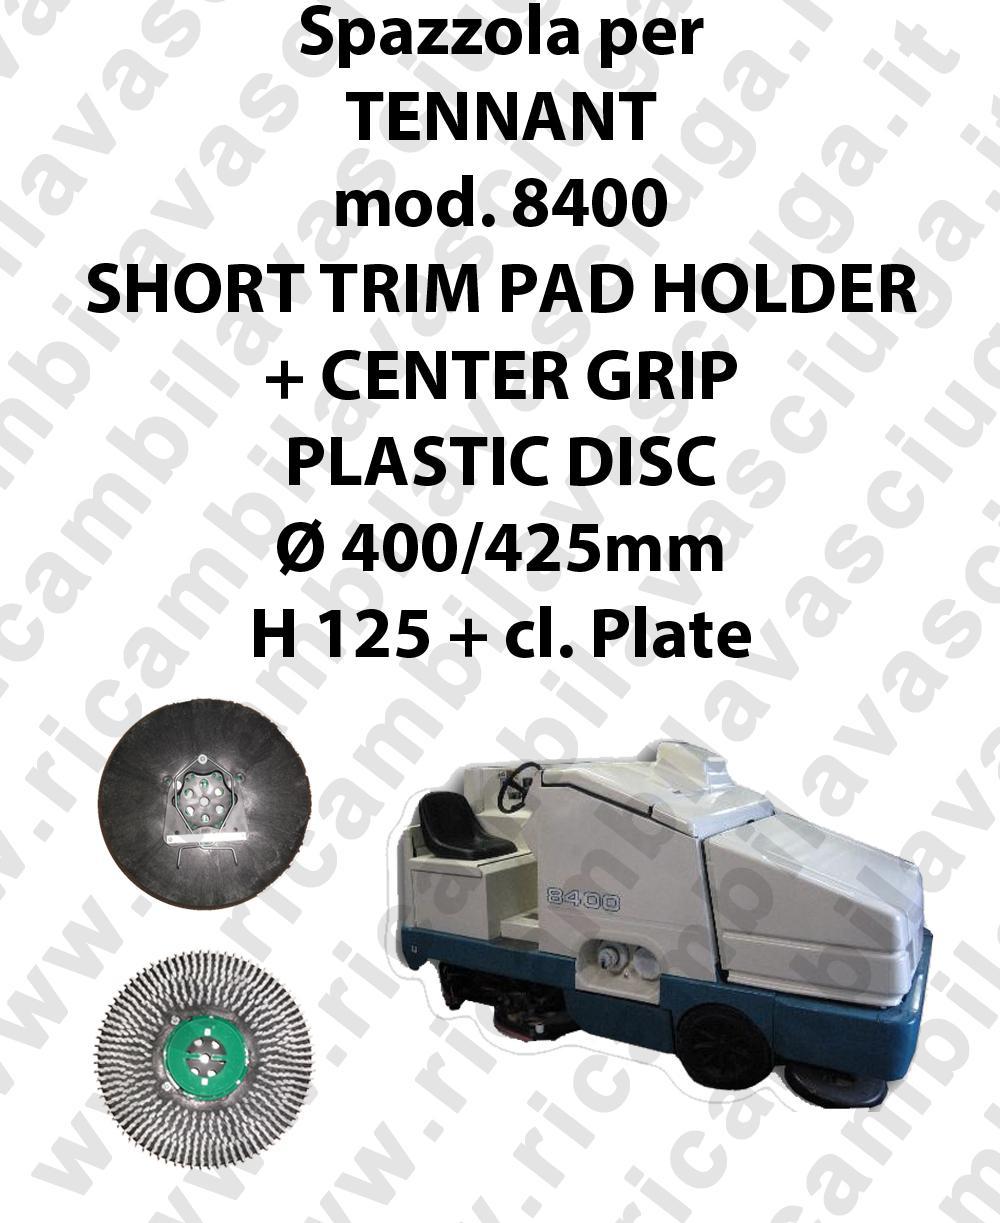 SHORT TRIM PAD HOLDER + CENTER GRIP pour autolaveuses TENNANT Reference 8400